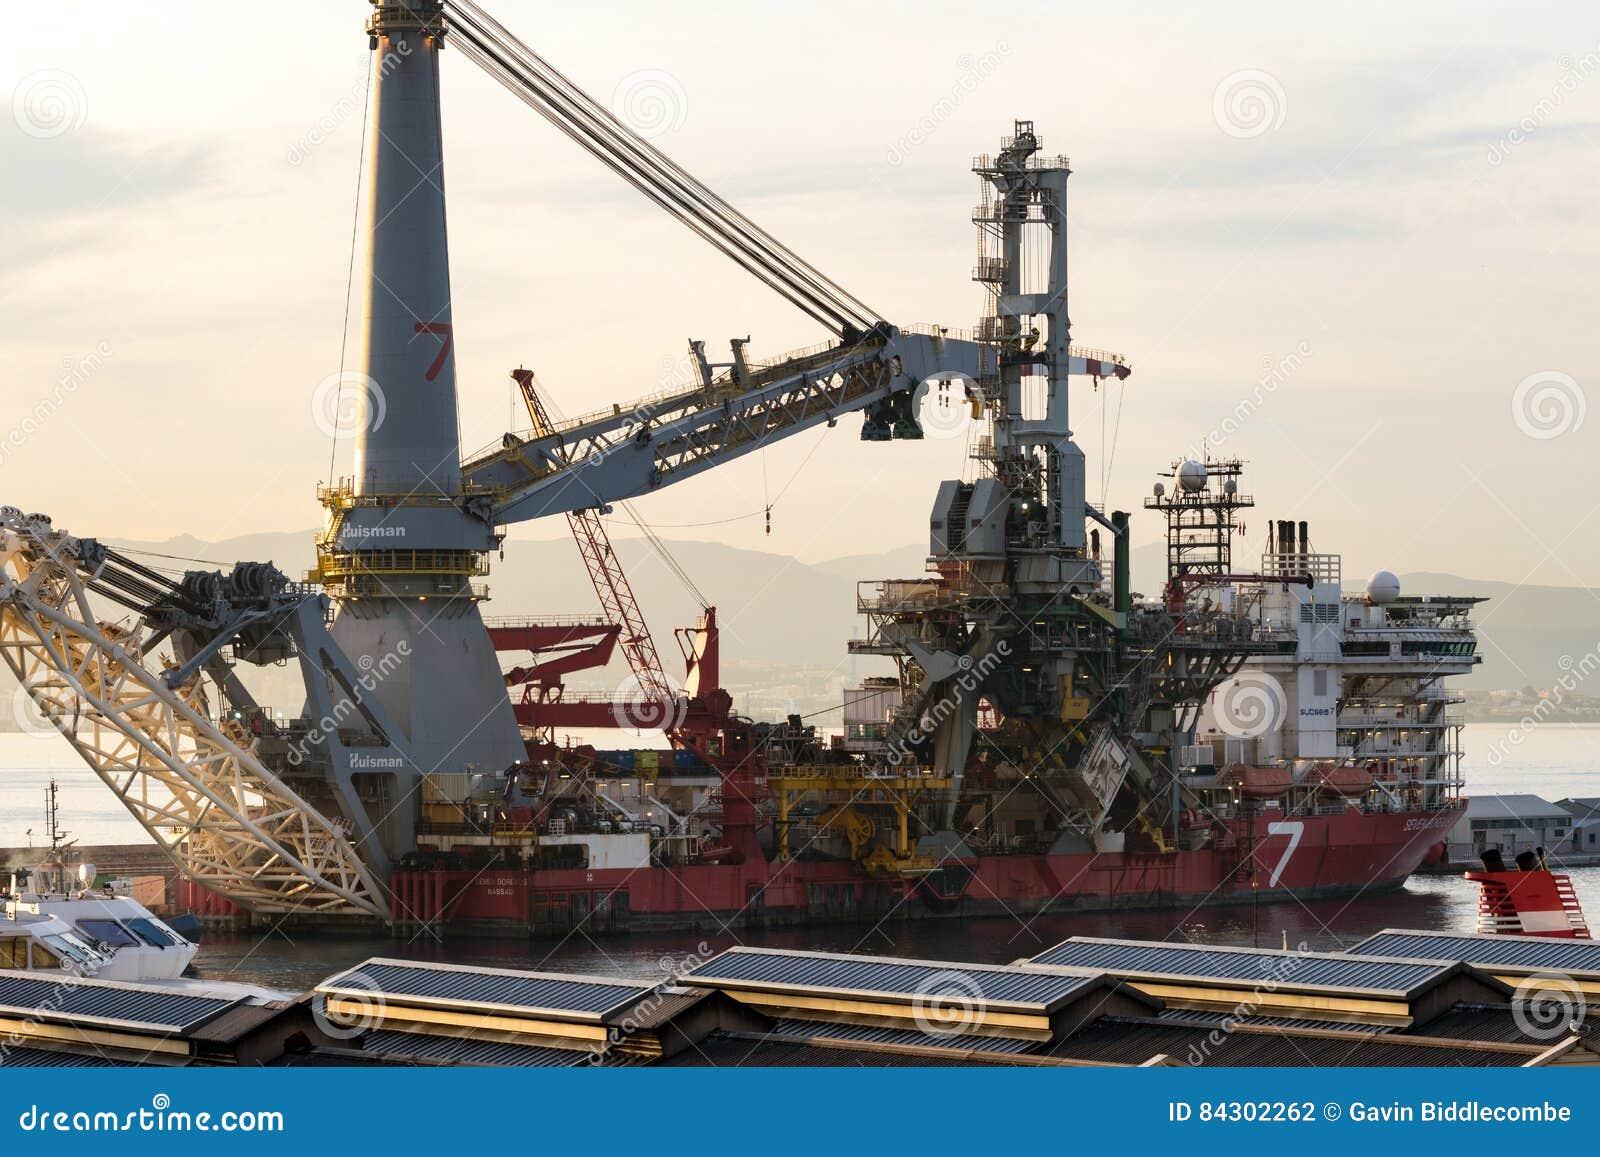 No. 7 Ship in Dock